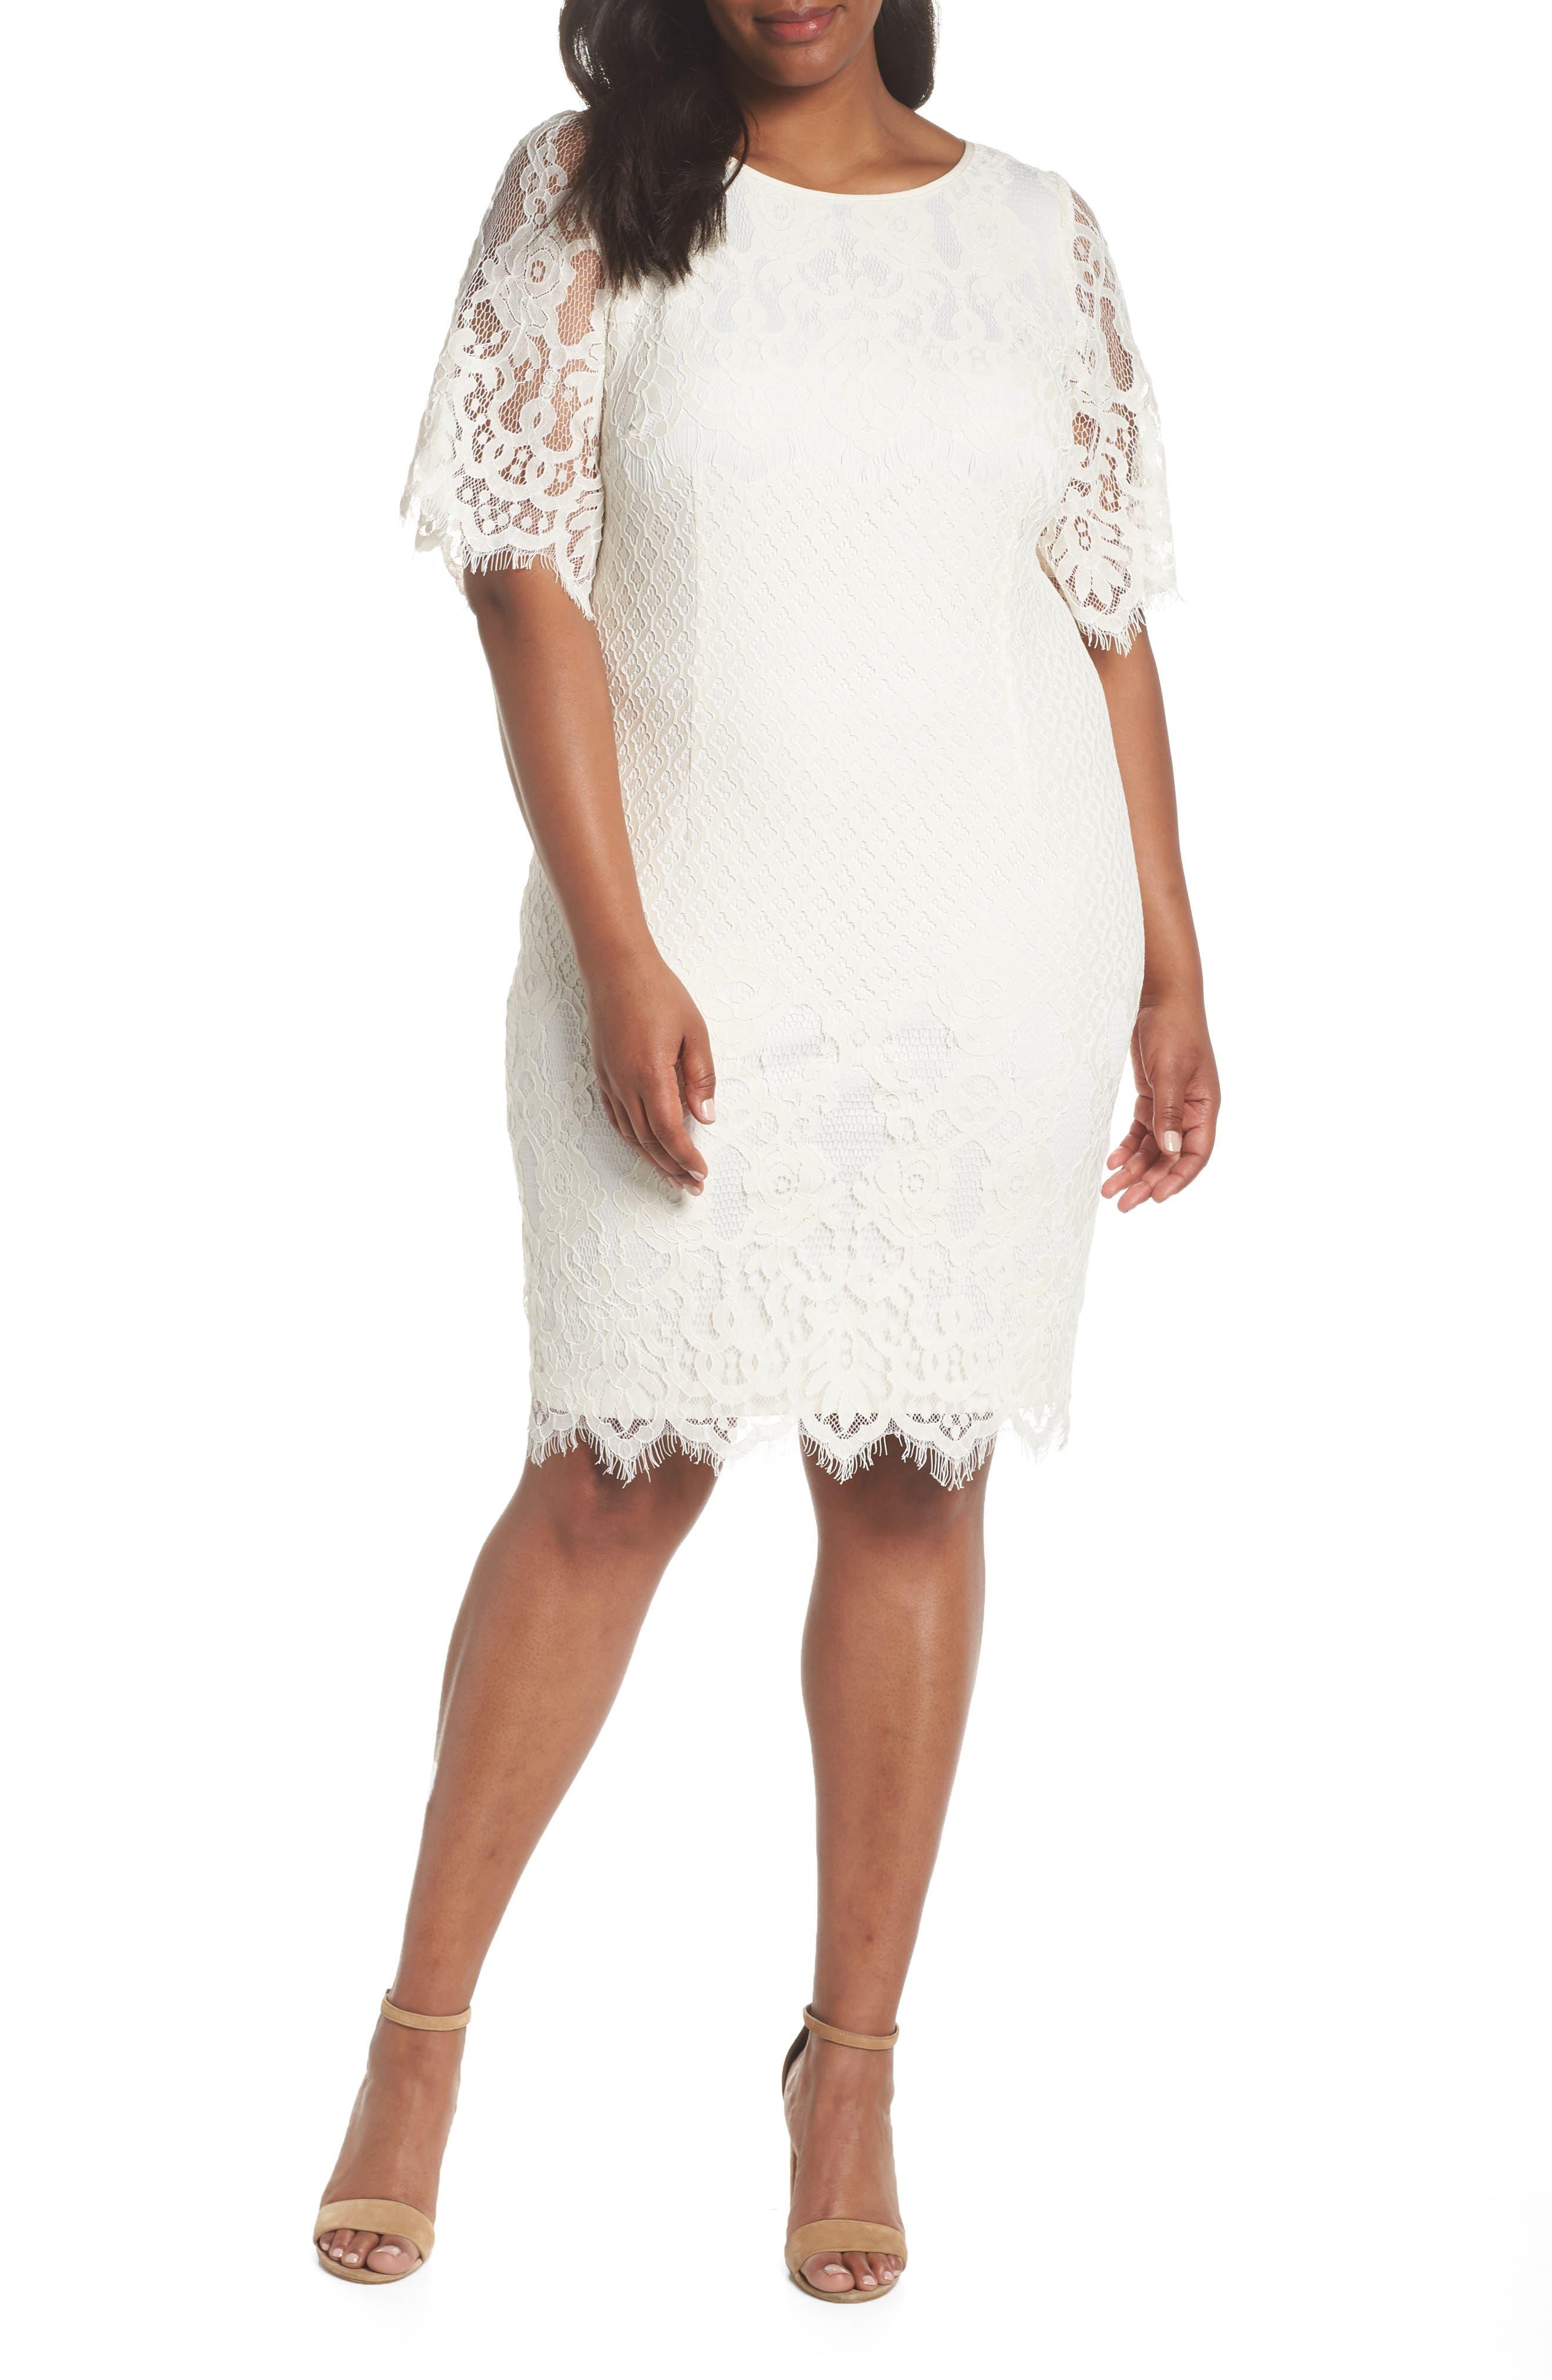 Plus Size Adrianna Papell Georgia Scalloped Lace Sheath Dress, Ivory